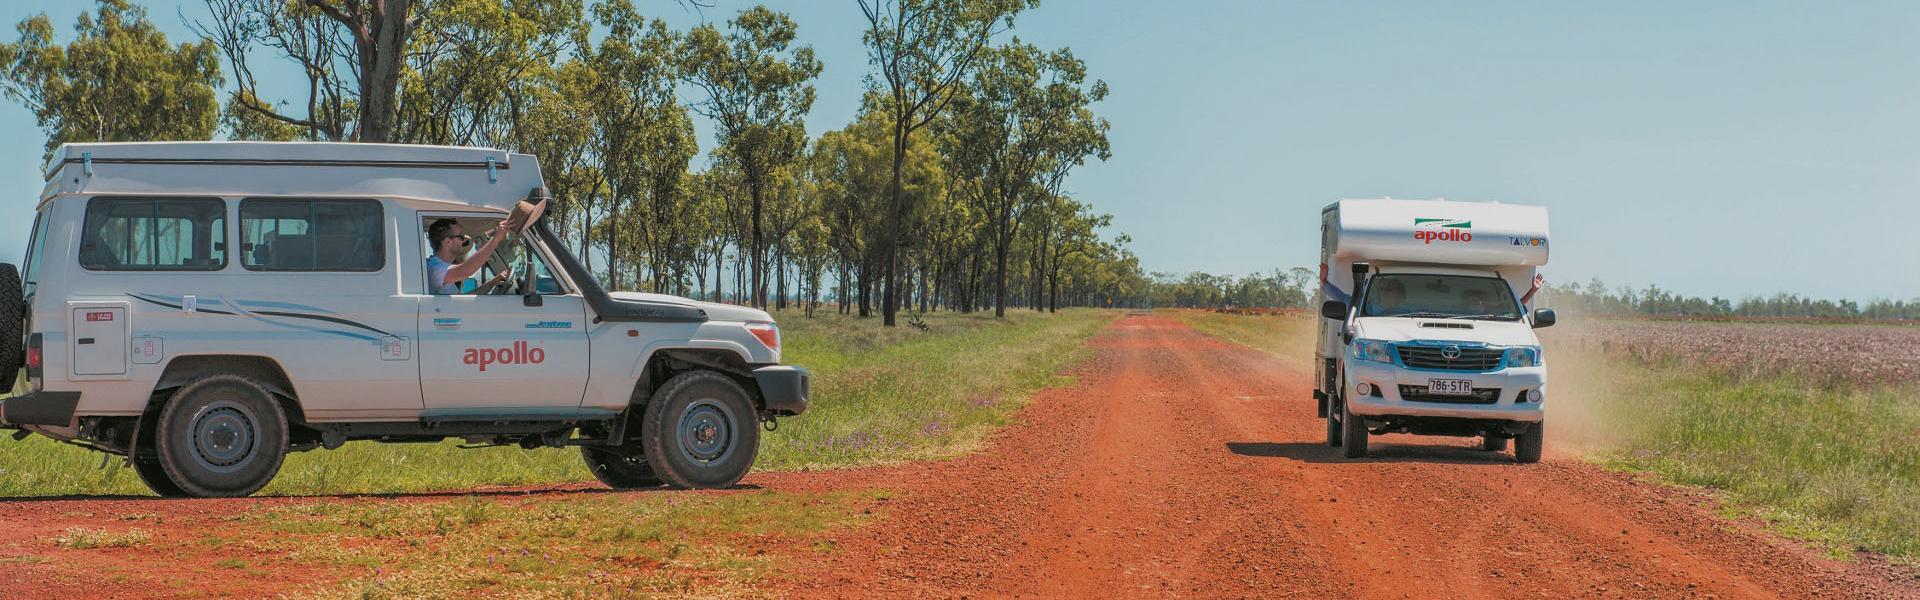 Apollo Campers Australië